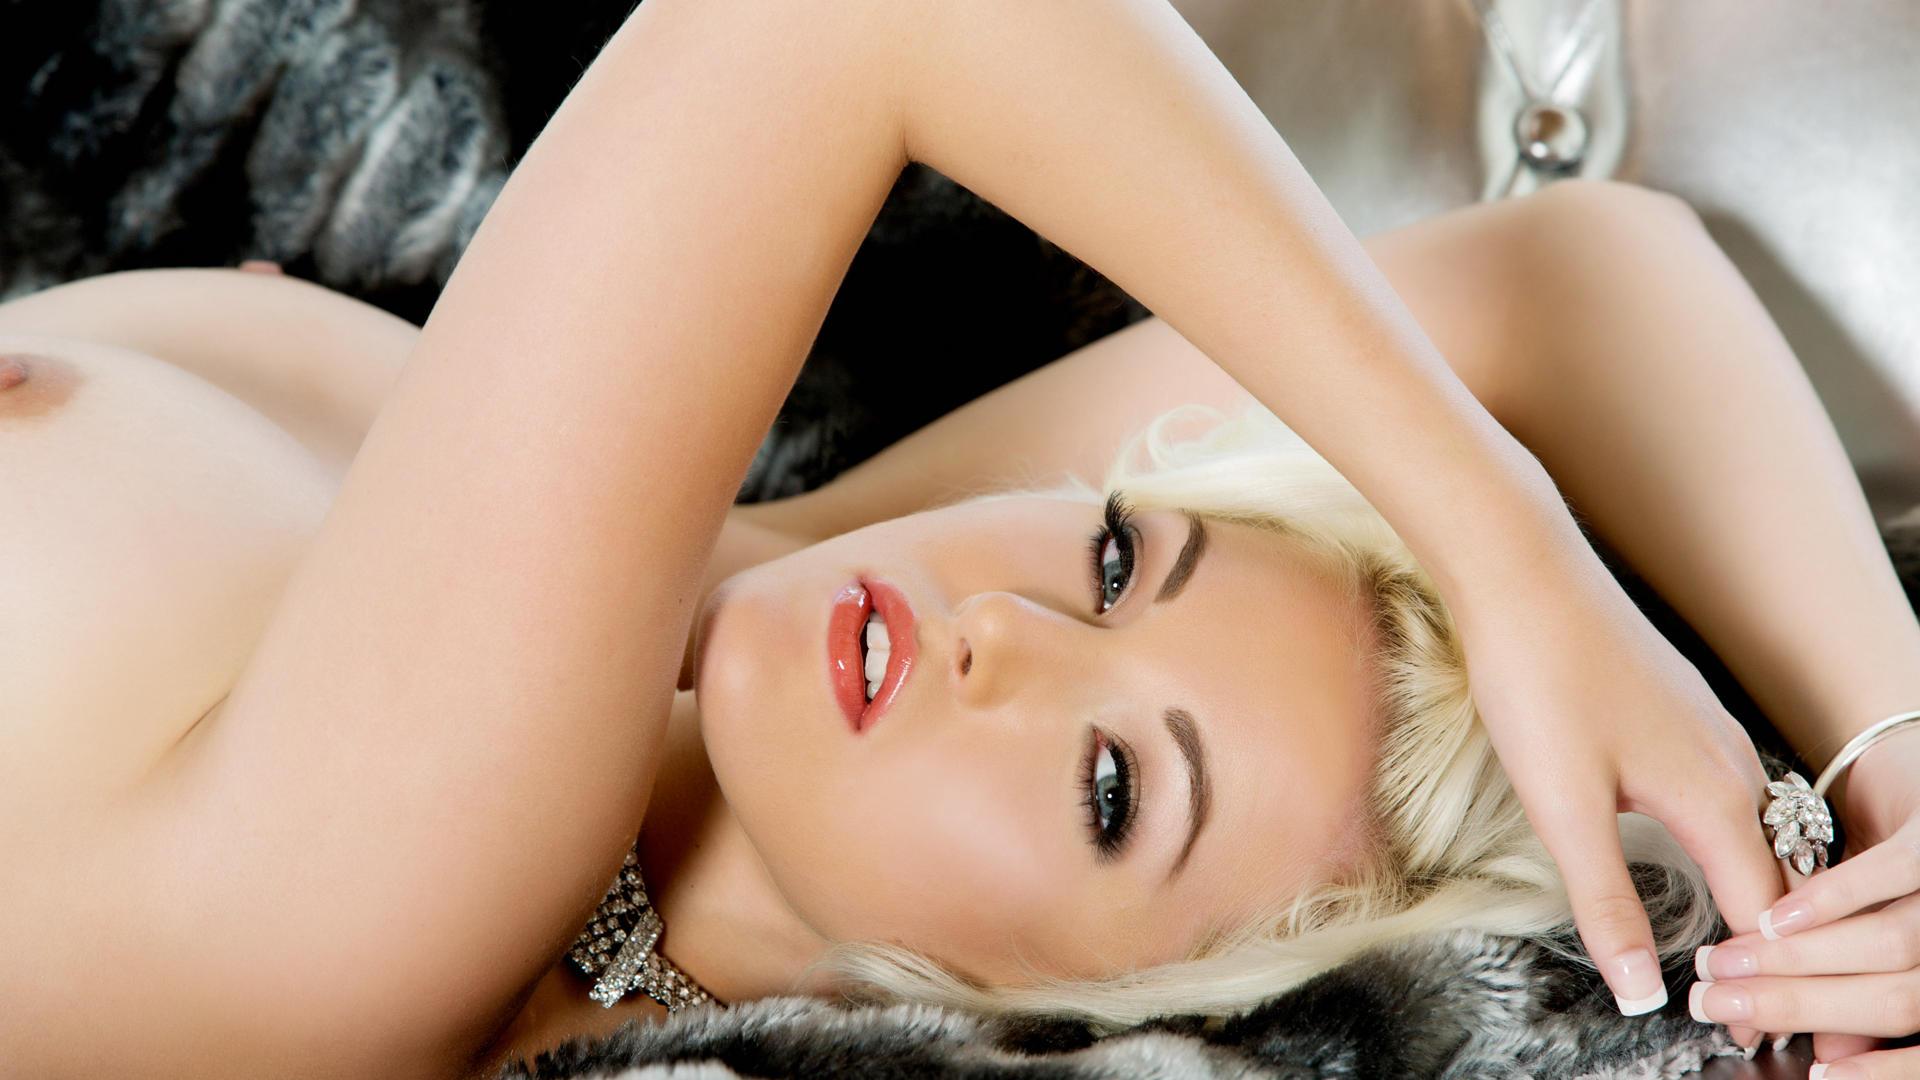 download photo 1920x1080 jenna ivory amazing sexy girl